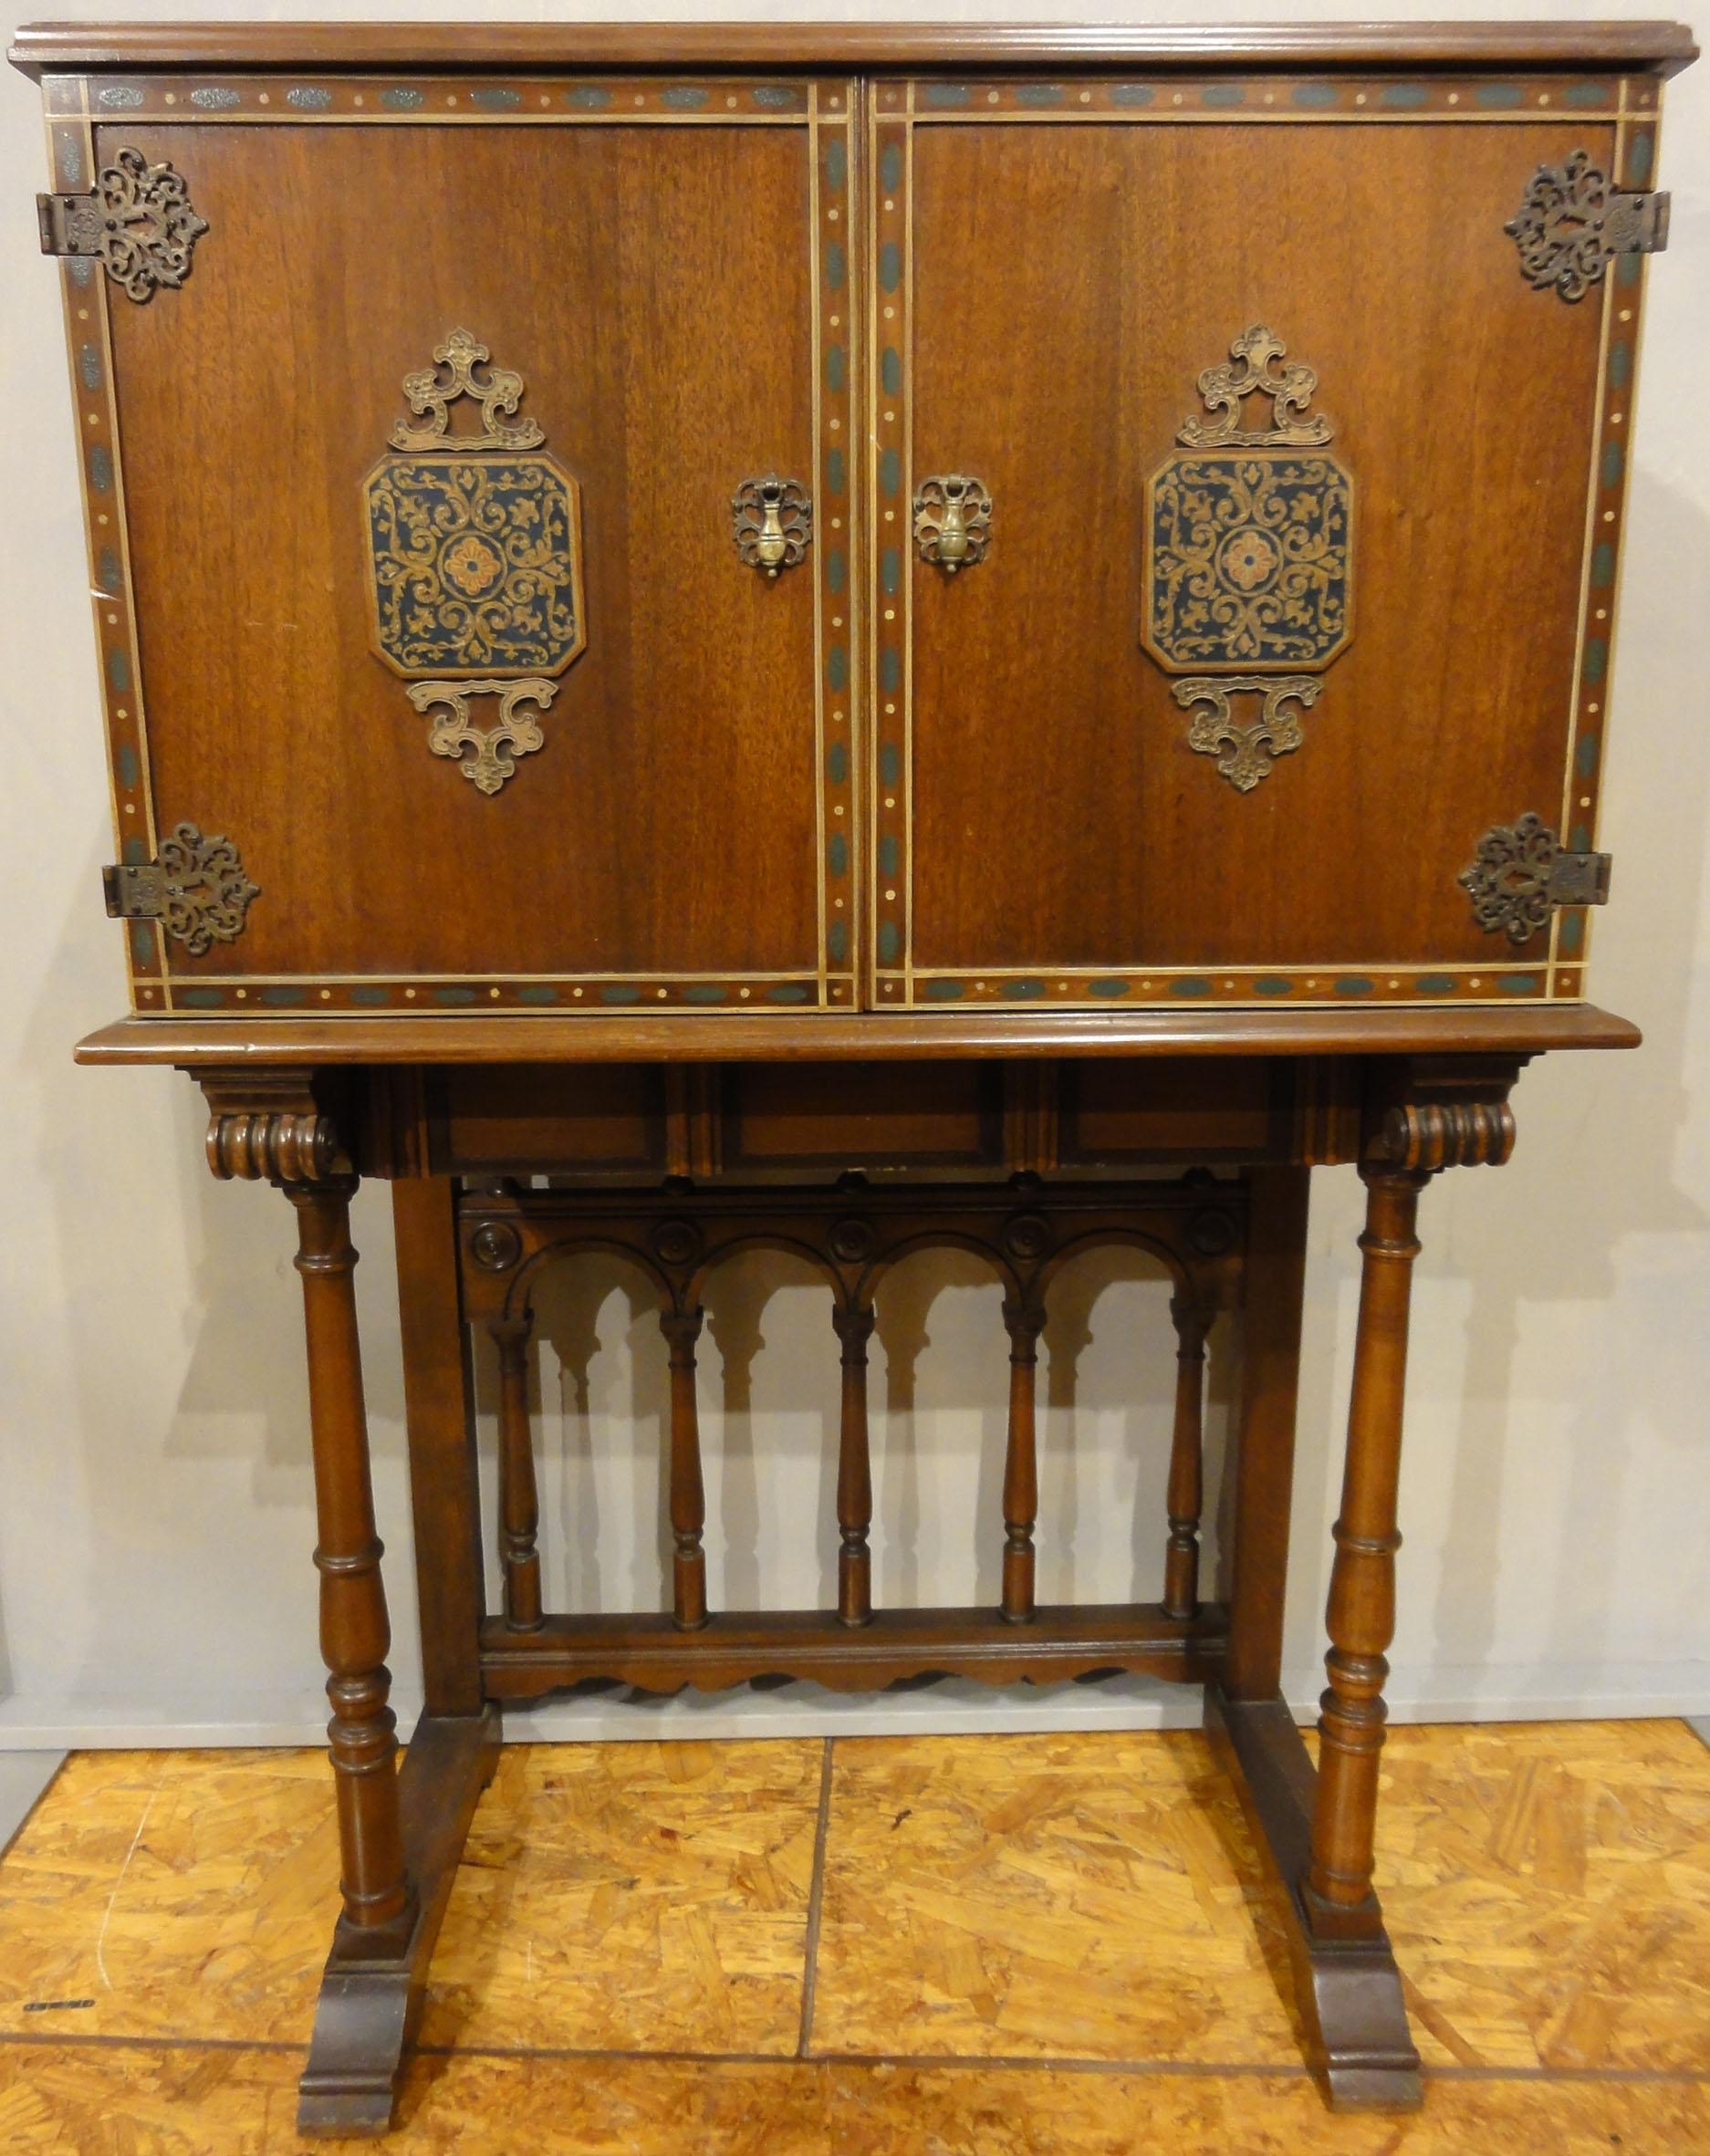 Antique Radio Cabinet. A genuine good condition antique sold by the Santa Barbara Design Center in Santa Barbara, California.